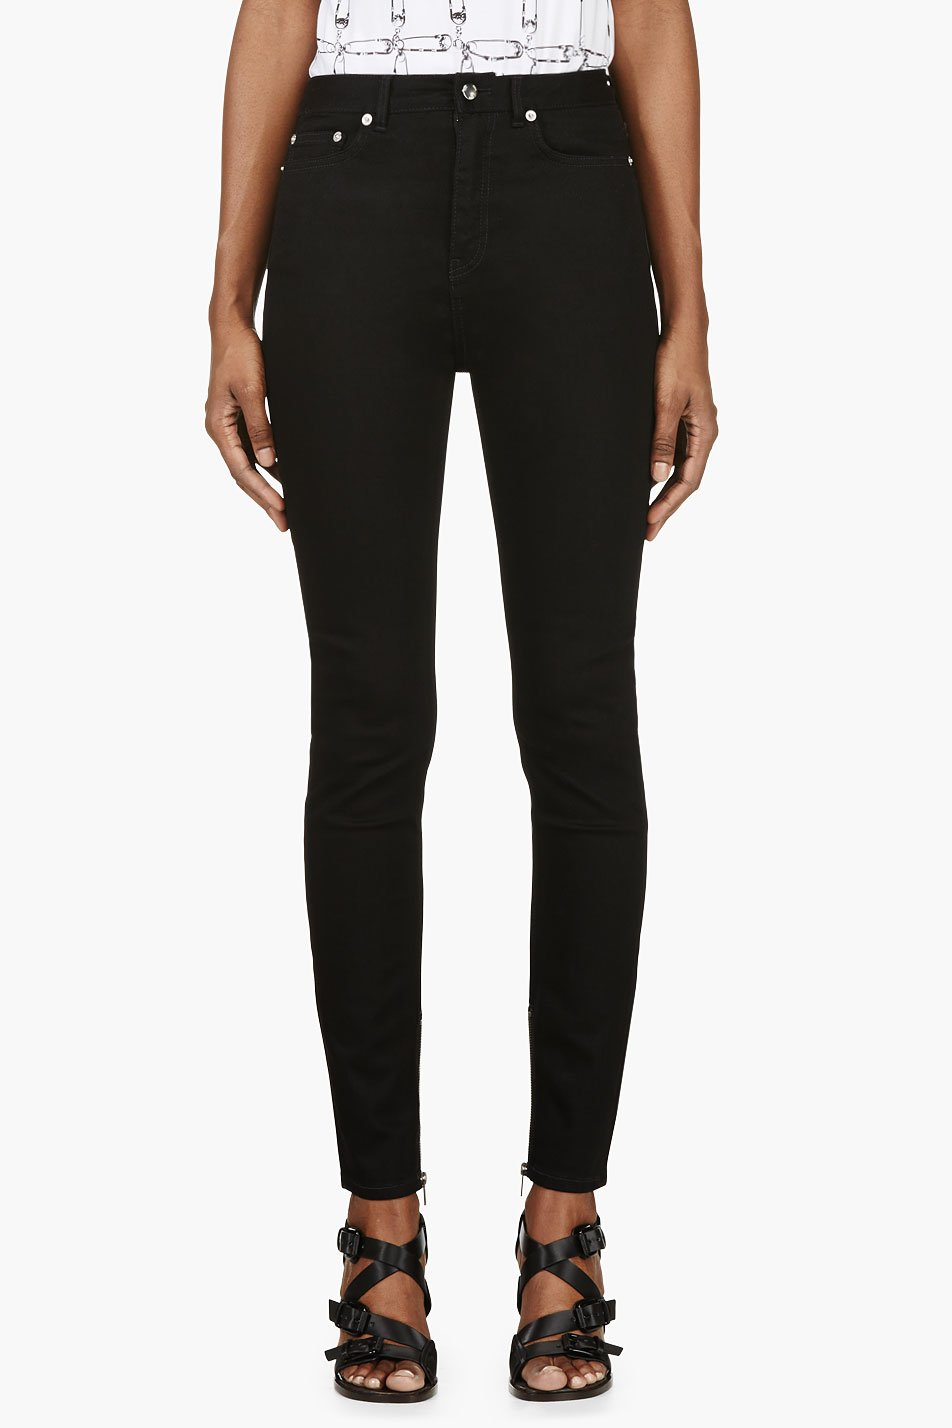 Blk dnm black high waist skinny jeans